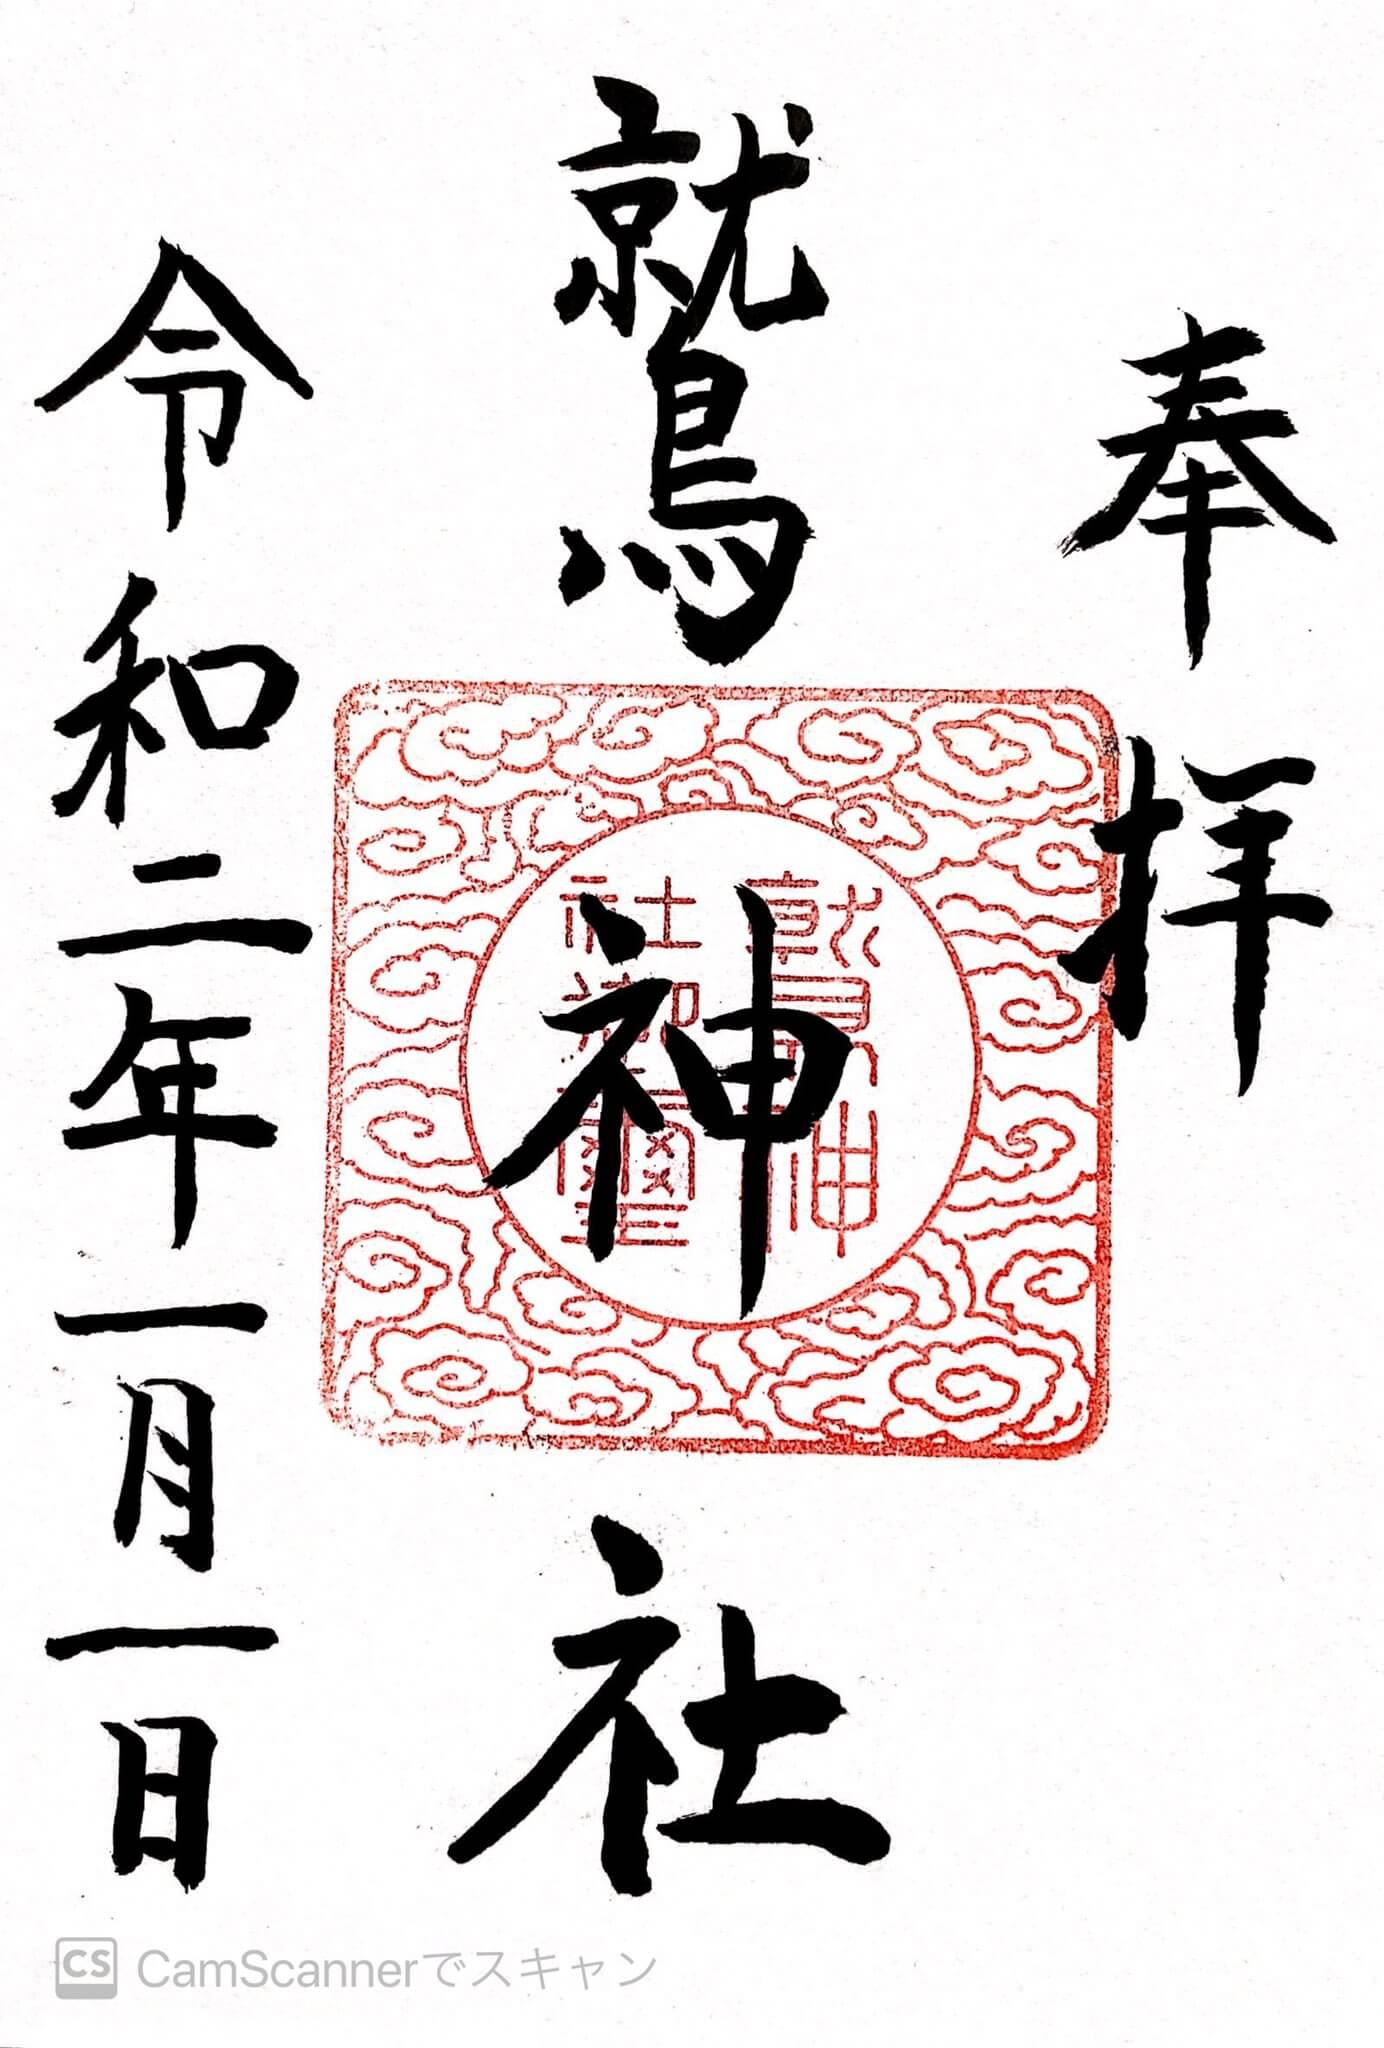 鷲神社の御朱印(社名印)